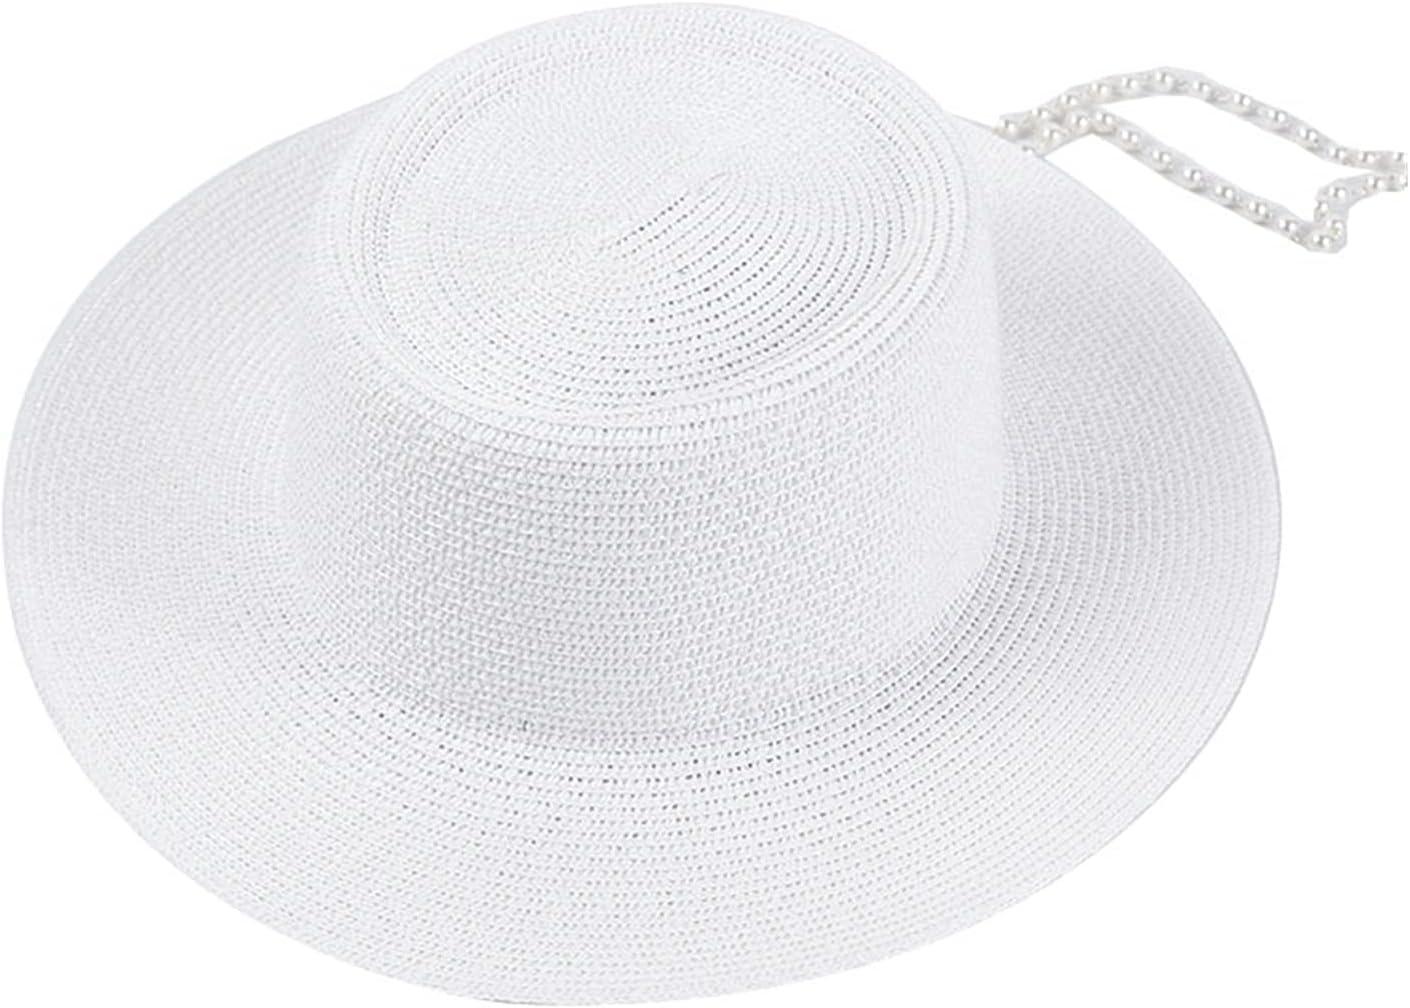 JSJJAWD Sunhat Women Summer Hats hat Straw Panama Fedo Max 41% OFF 2021 spring and summer new Sun